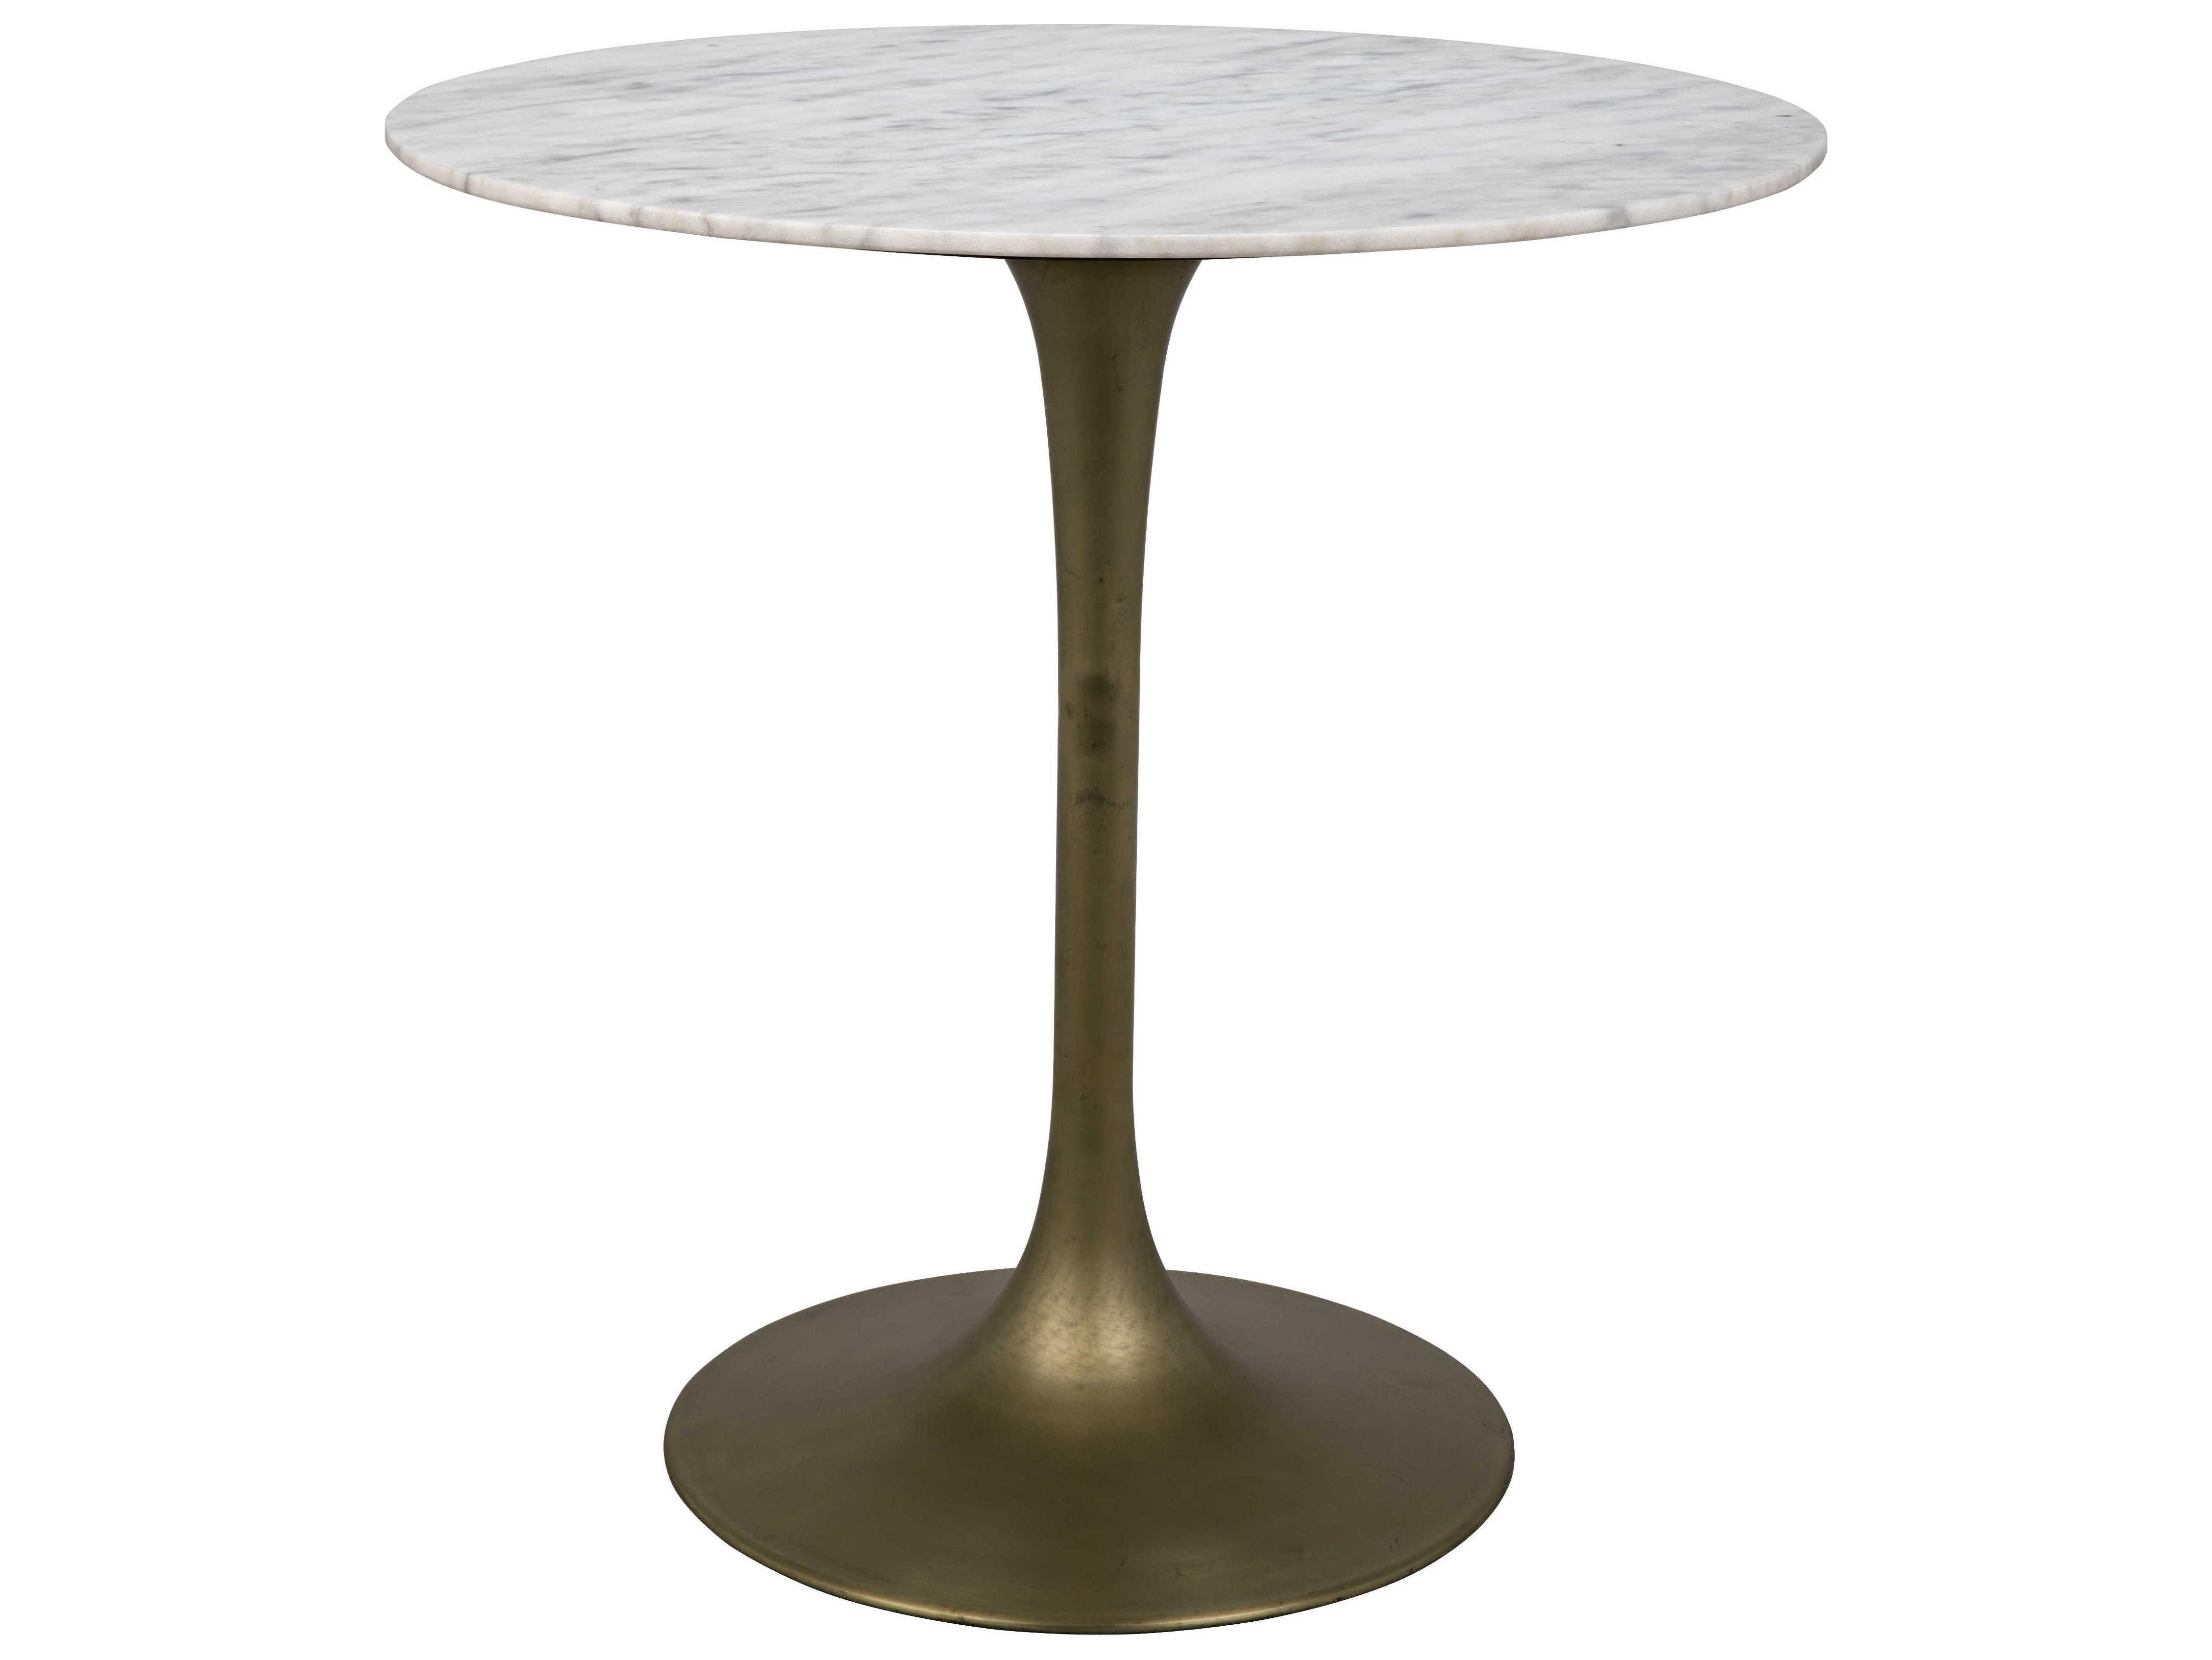 Noir Furniture Antique Brass 40 Wide Round Bar Height Dining Table Noigbar001mb40